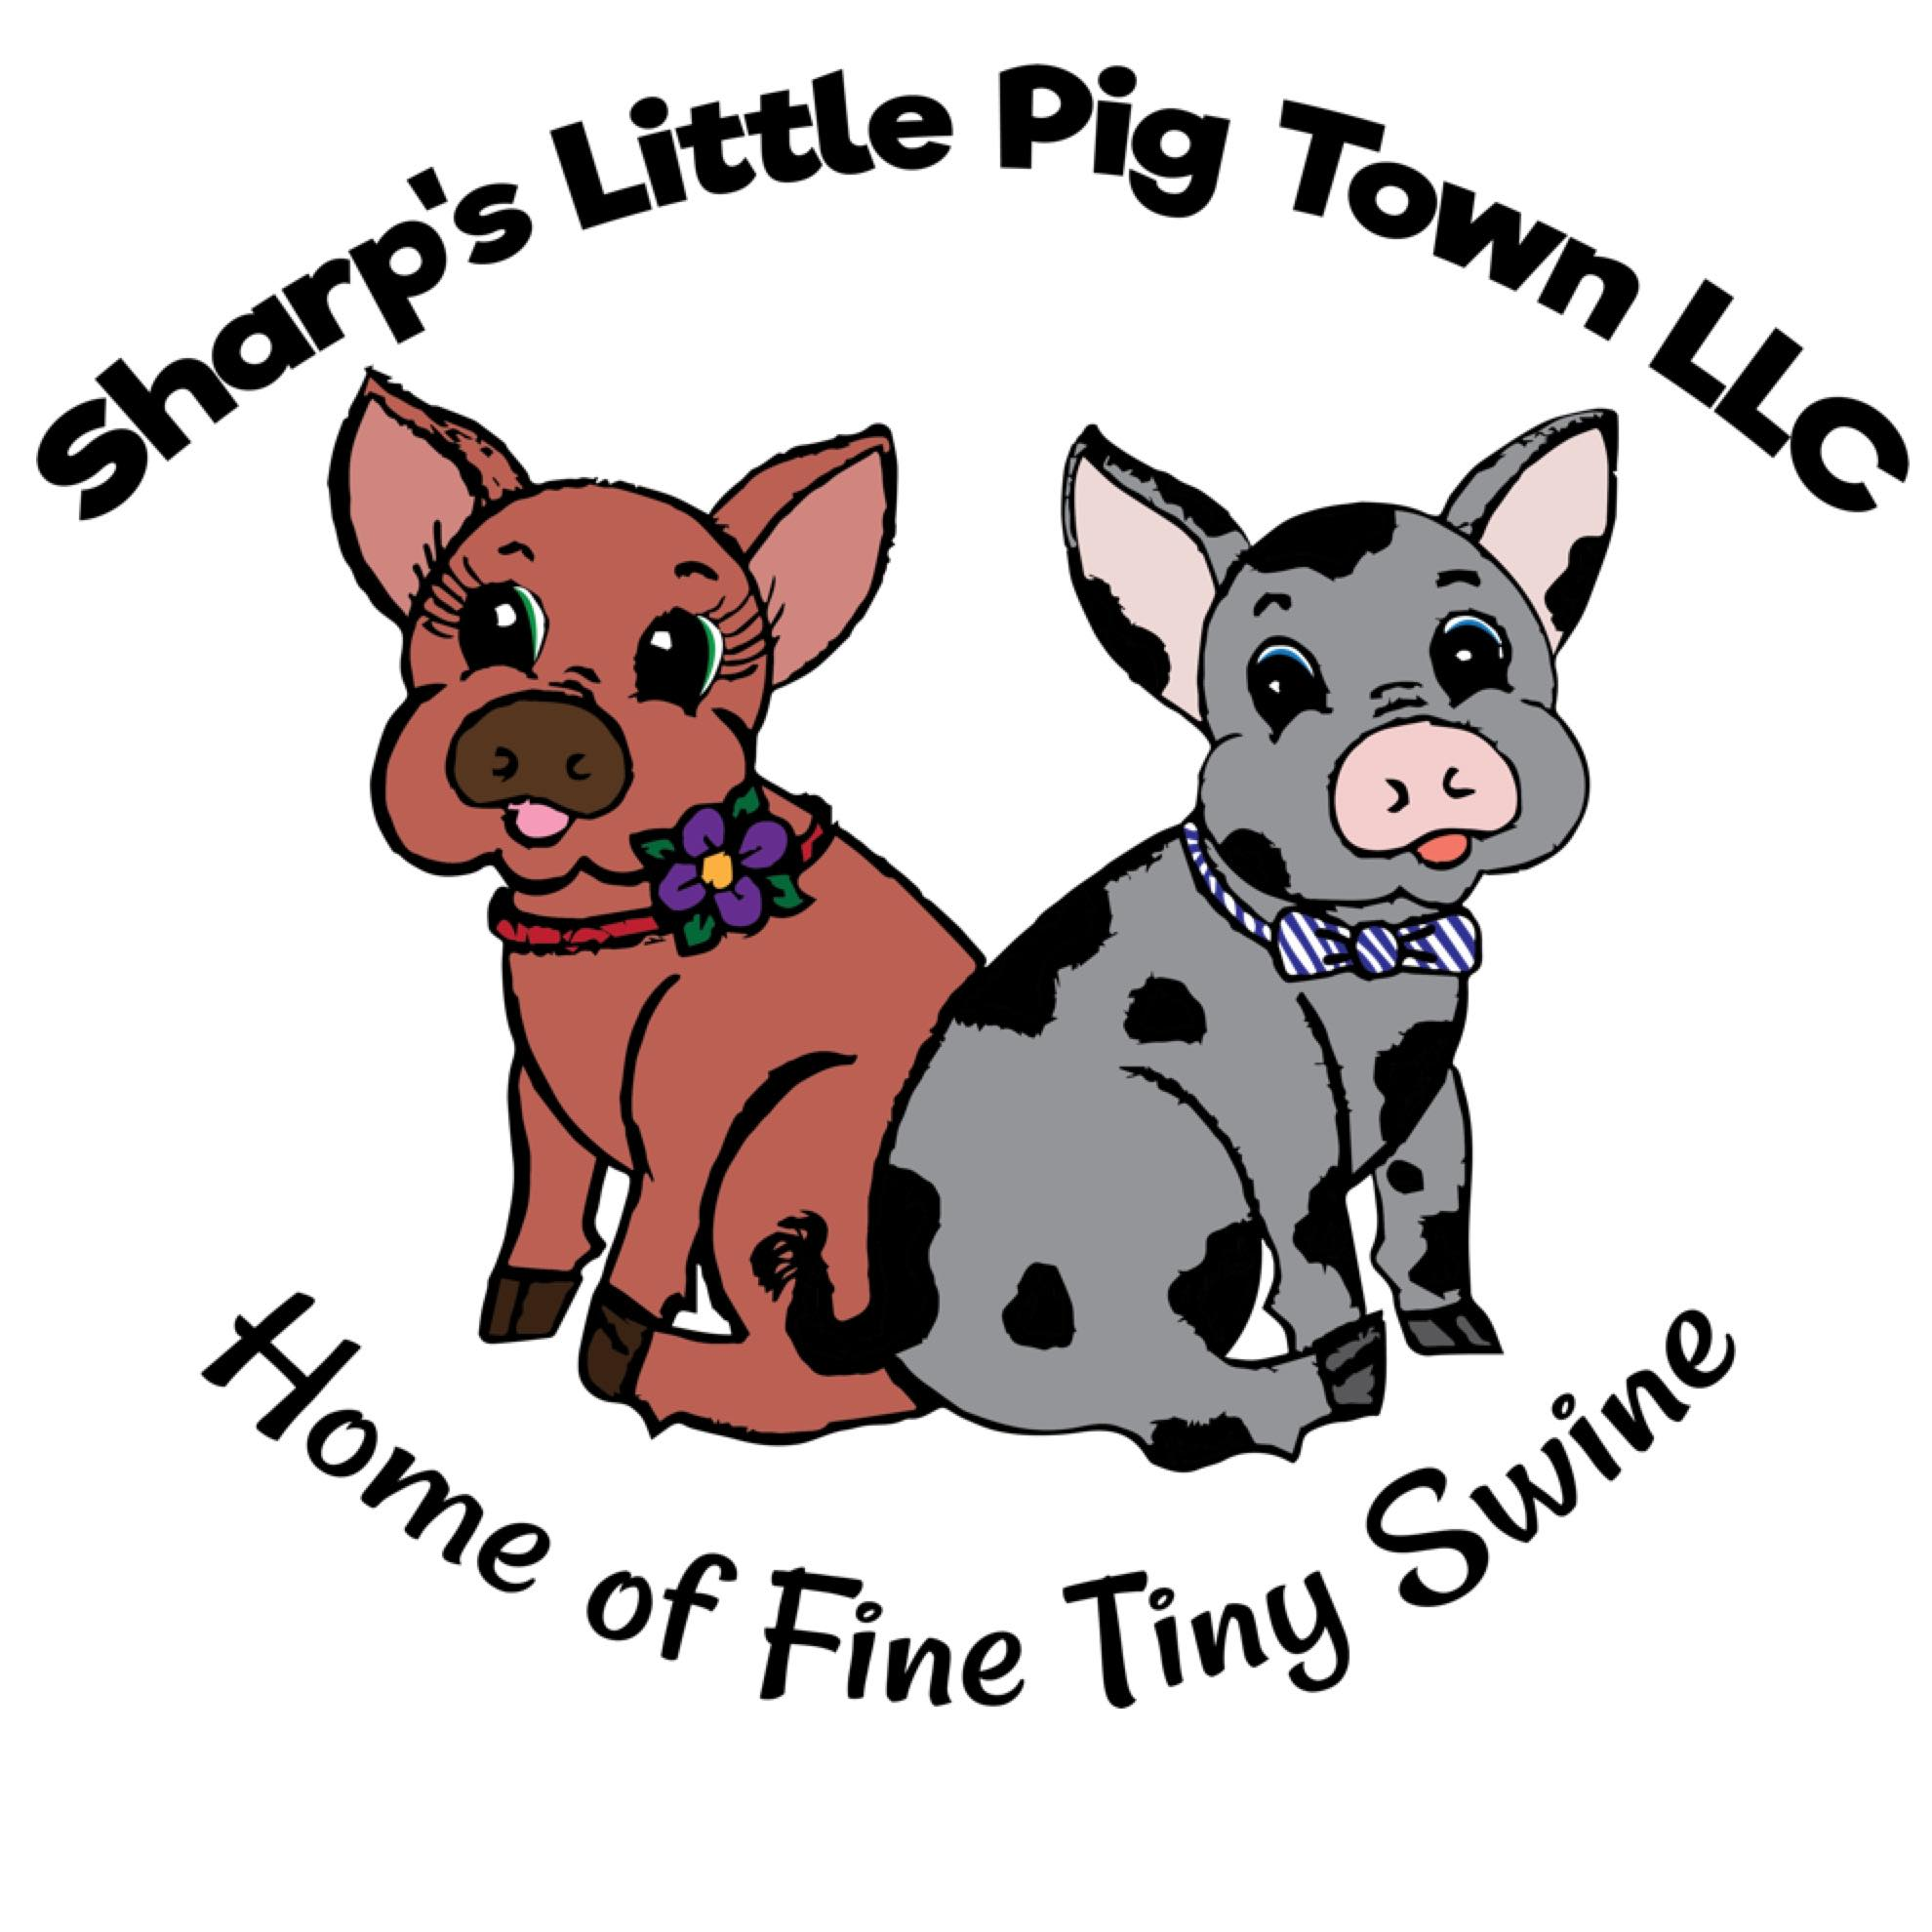 Sharp's mini pig